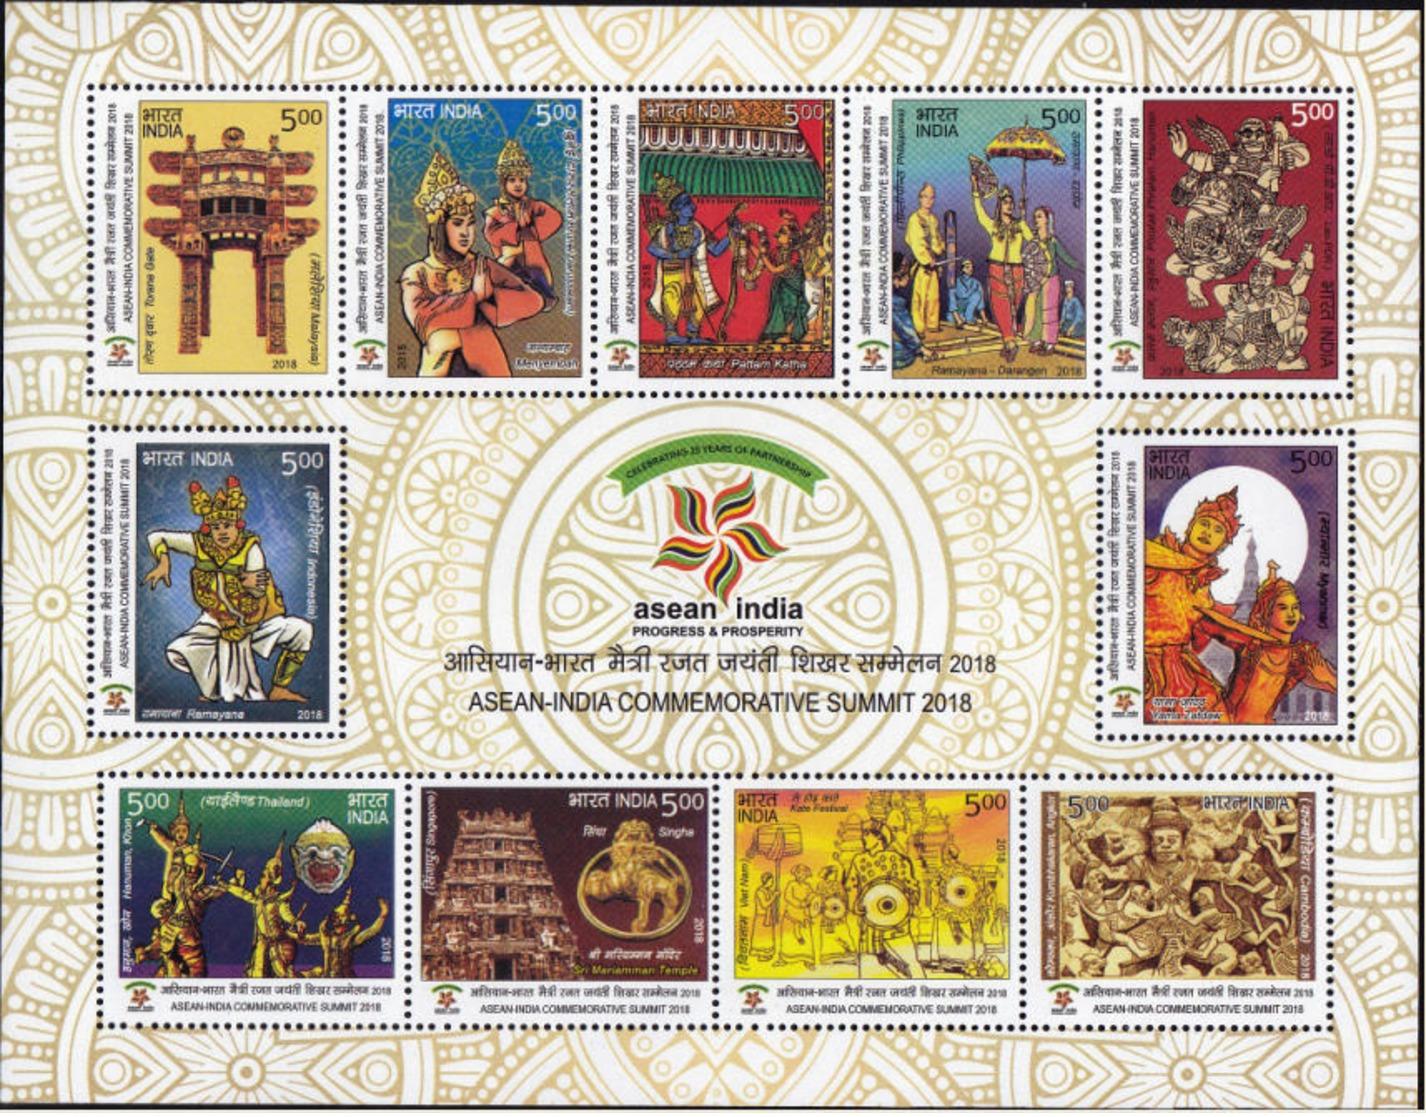 5X INDIA 2018 ASEAN India Commemorative Summit; Miniature Sheet, MINT - India